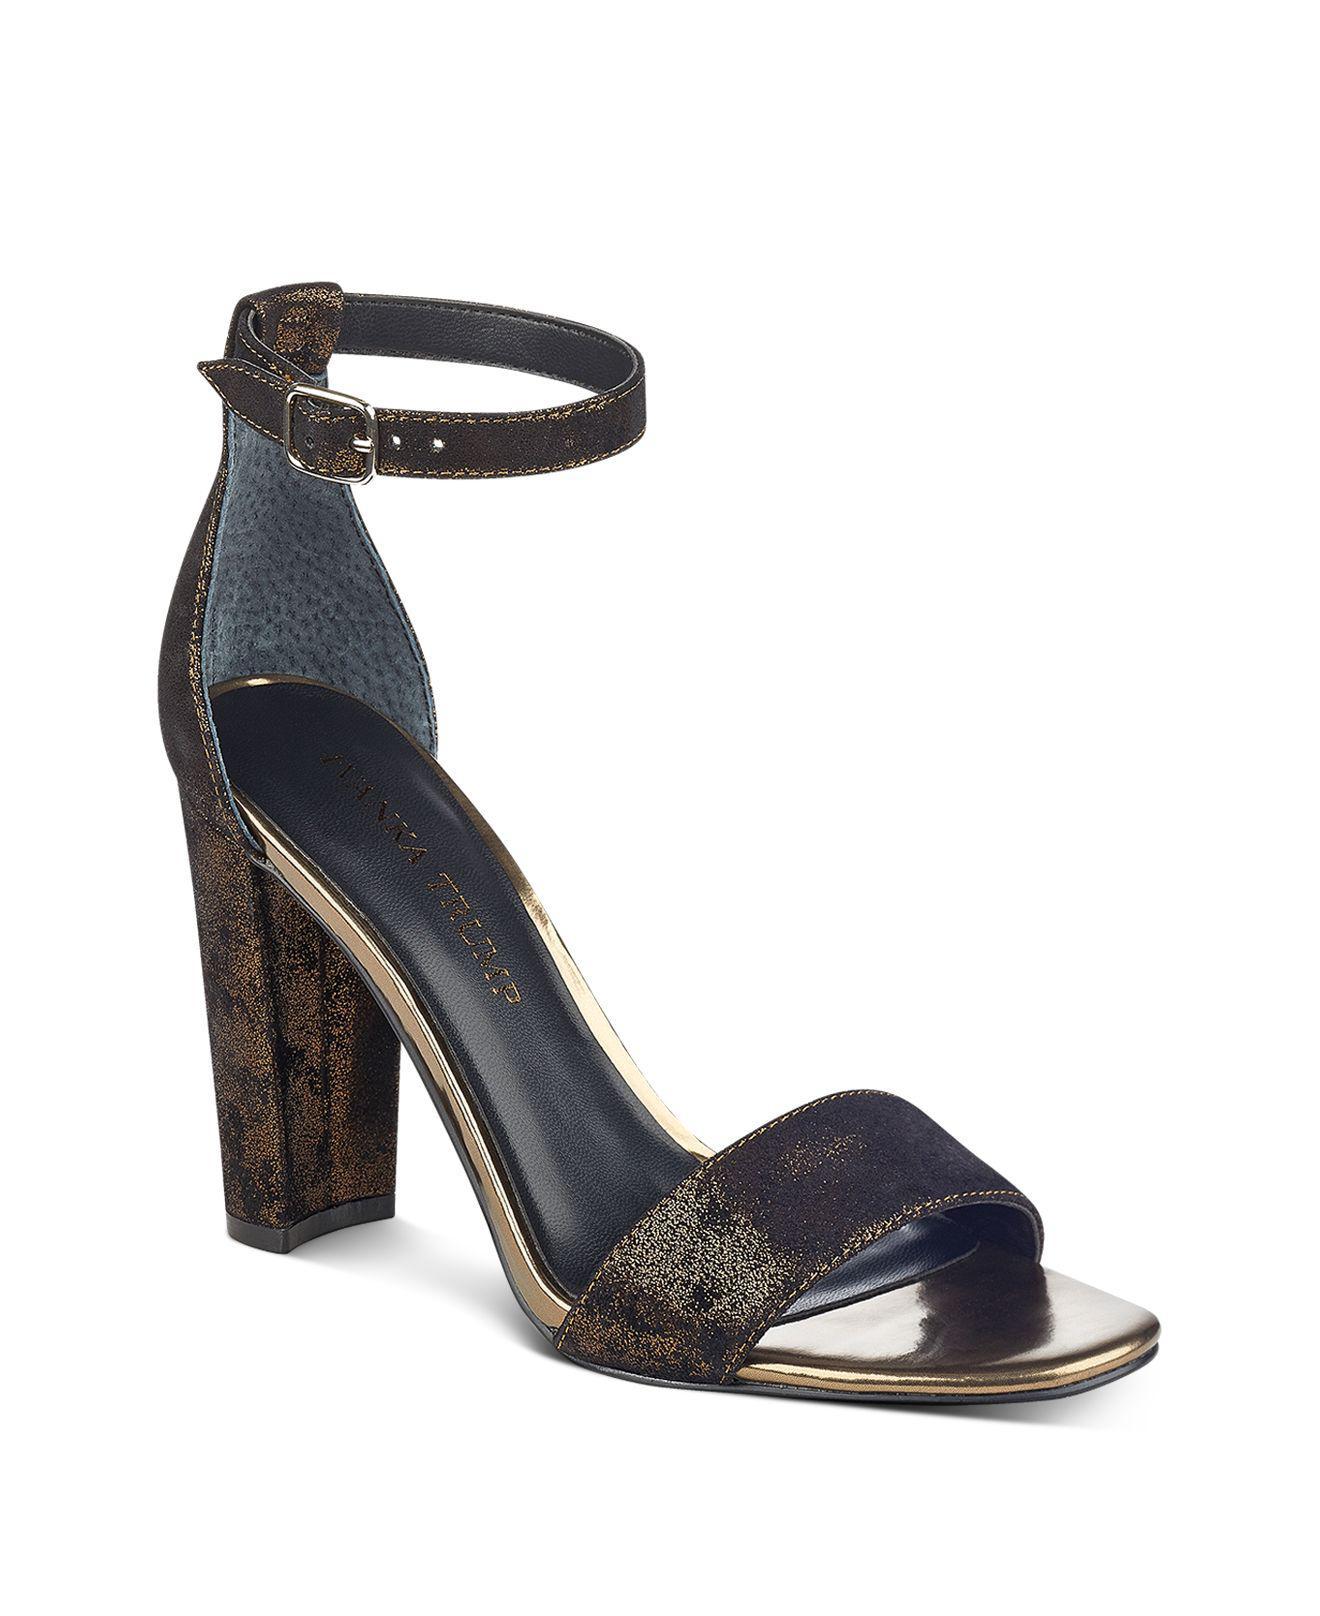 Ivanka Trump Emalyn Satin Ankle Strap Sparkle Heel Sandals OUPVl0